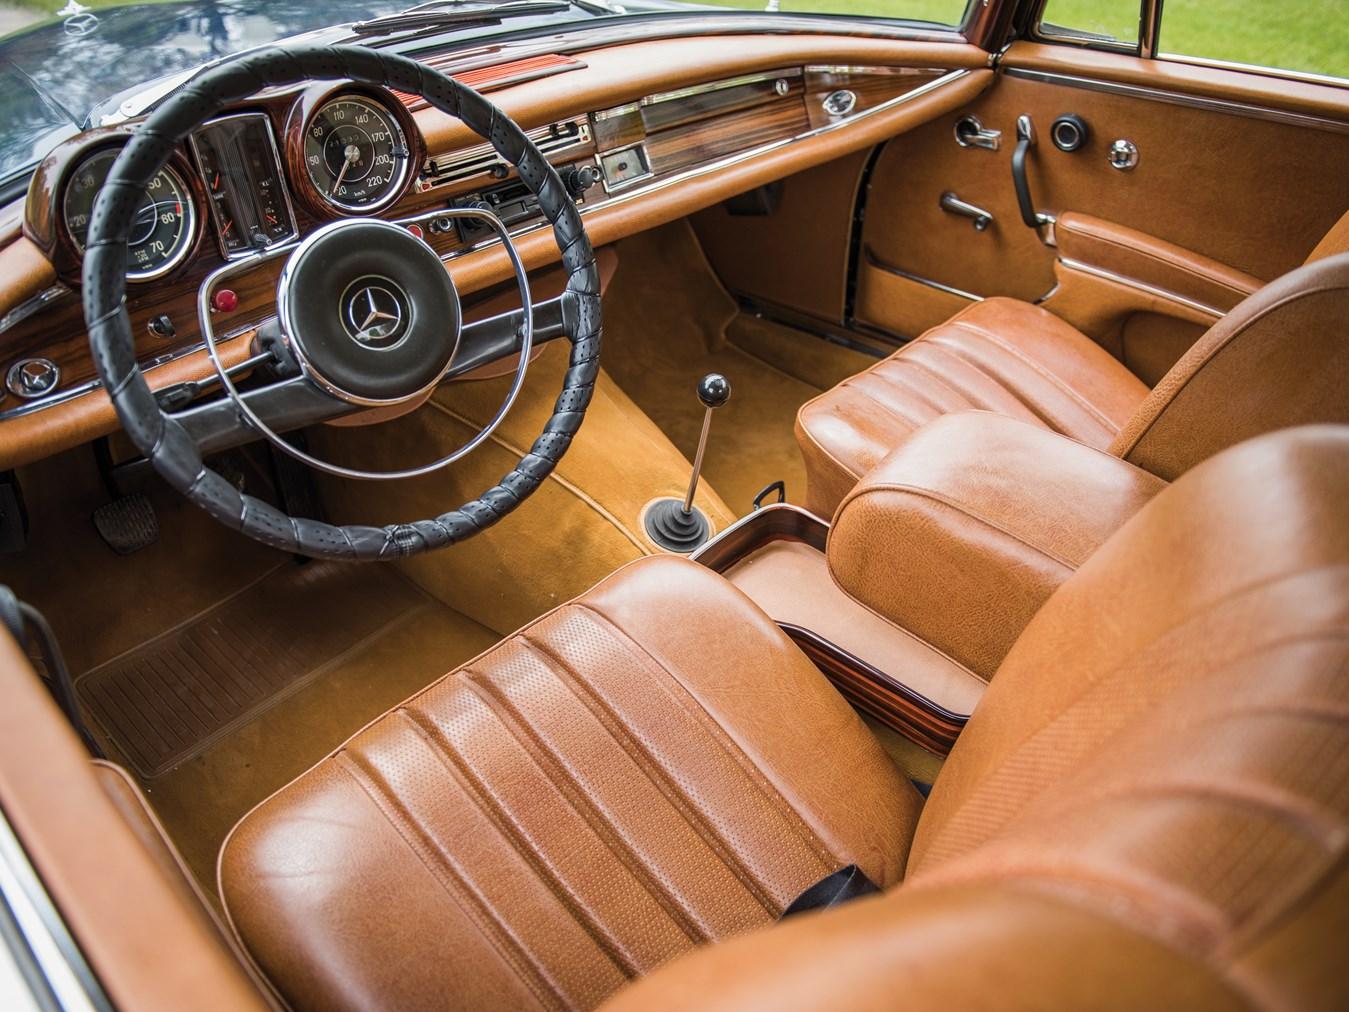 1965 mercedes benz 300 se coup revivaler for Interieur 1970